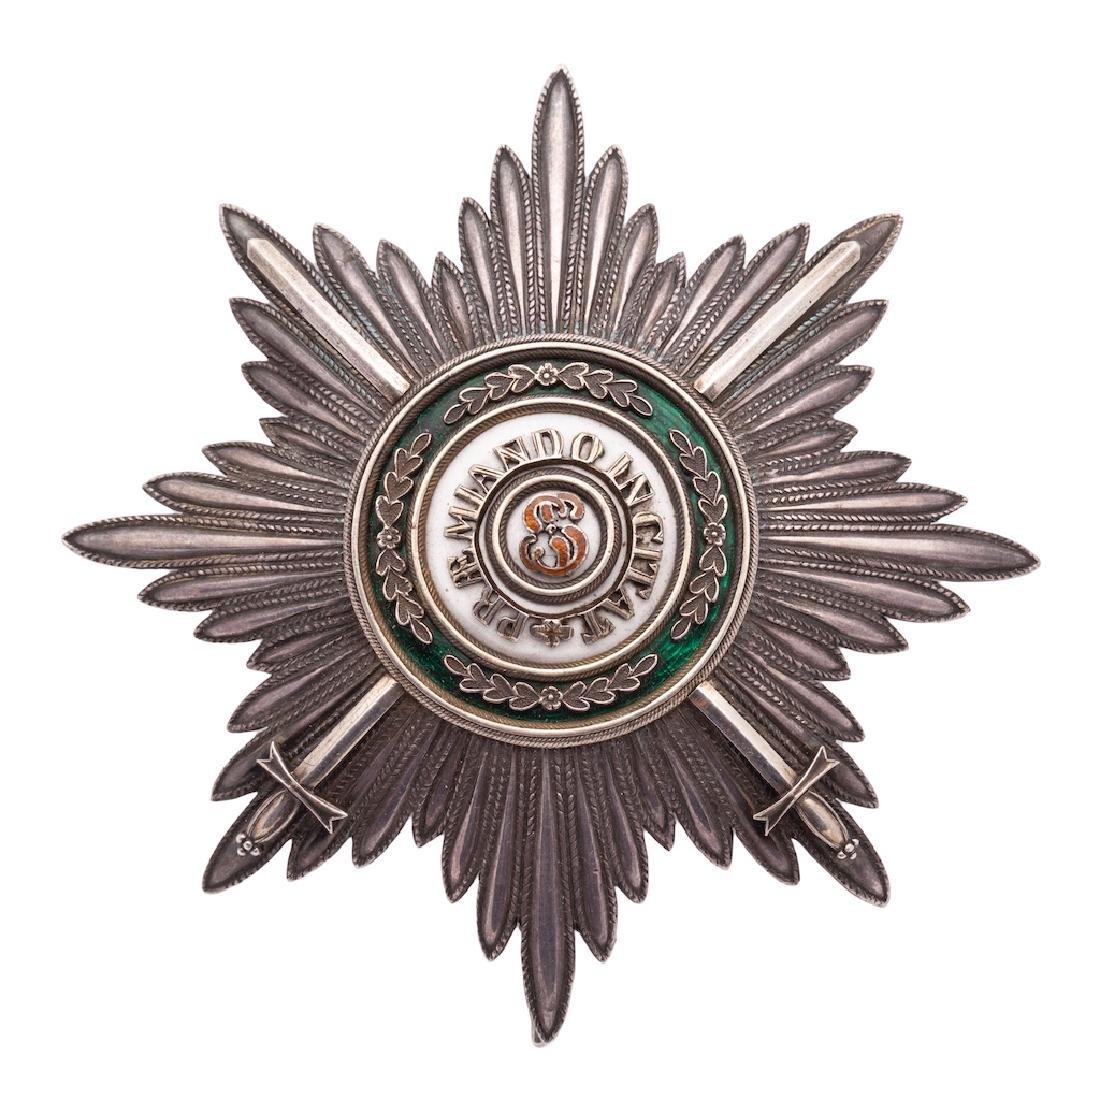 Breast star, Order of Saint Stanislaus I class